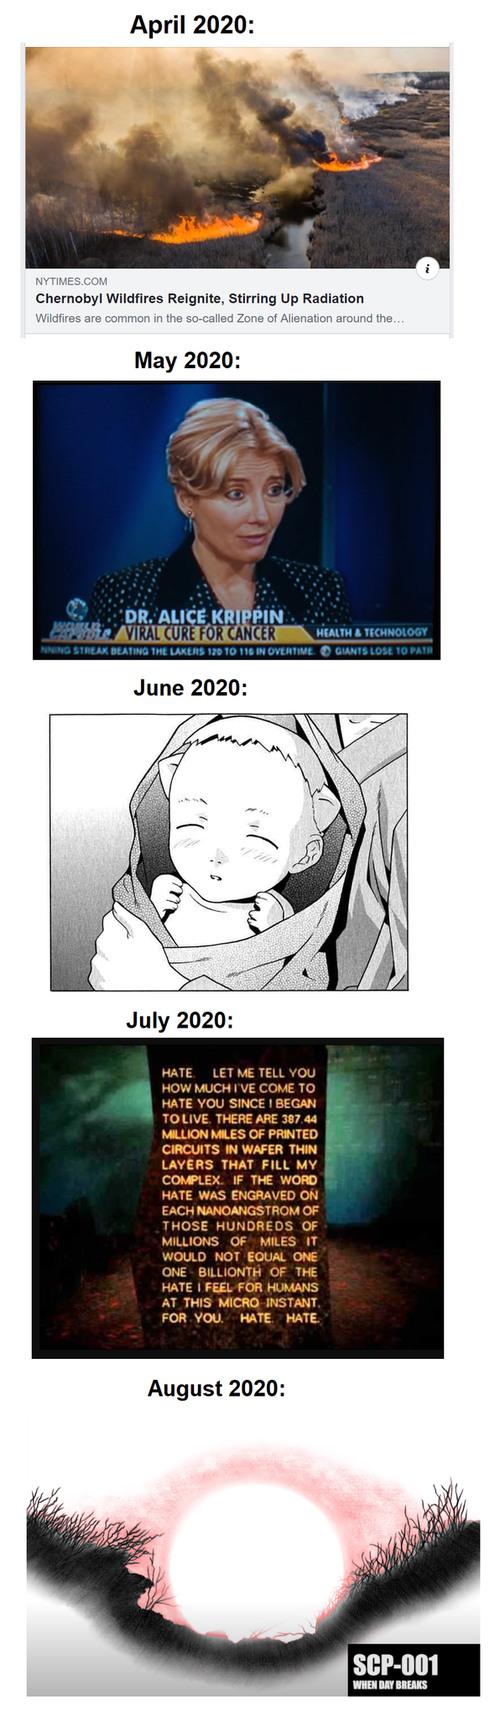 September 2020: Third Impact - meme